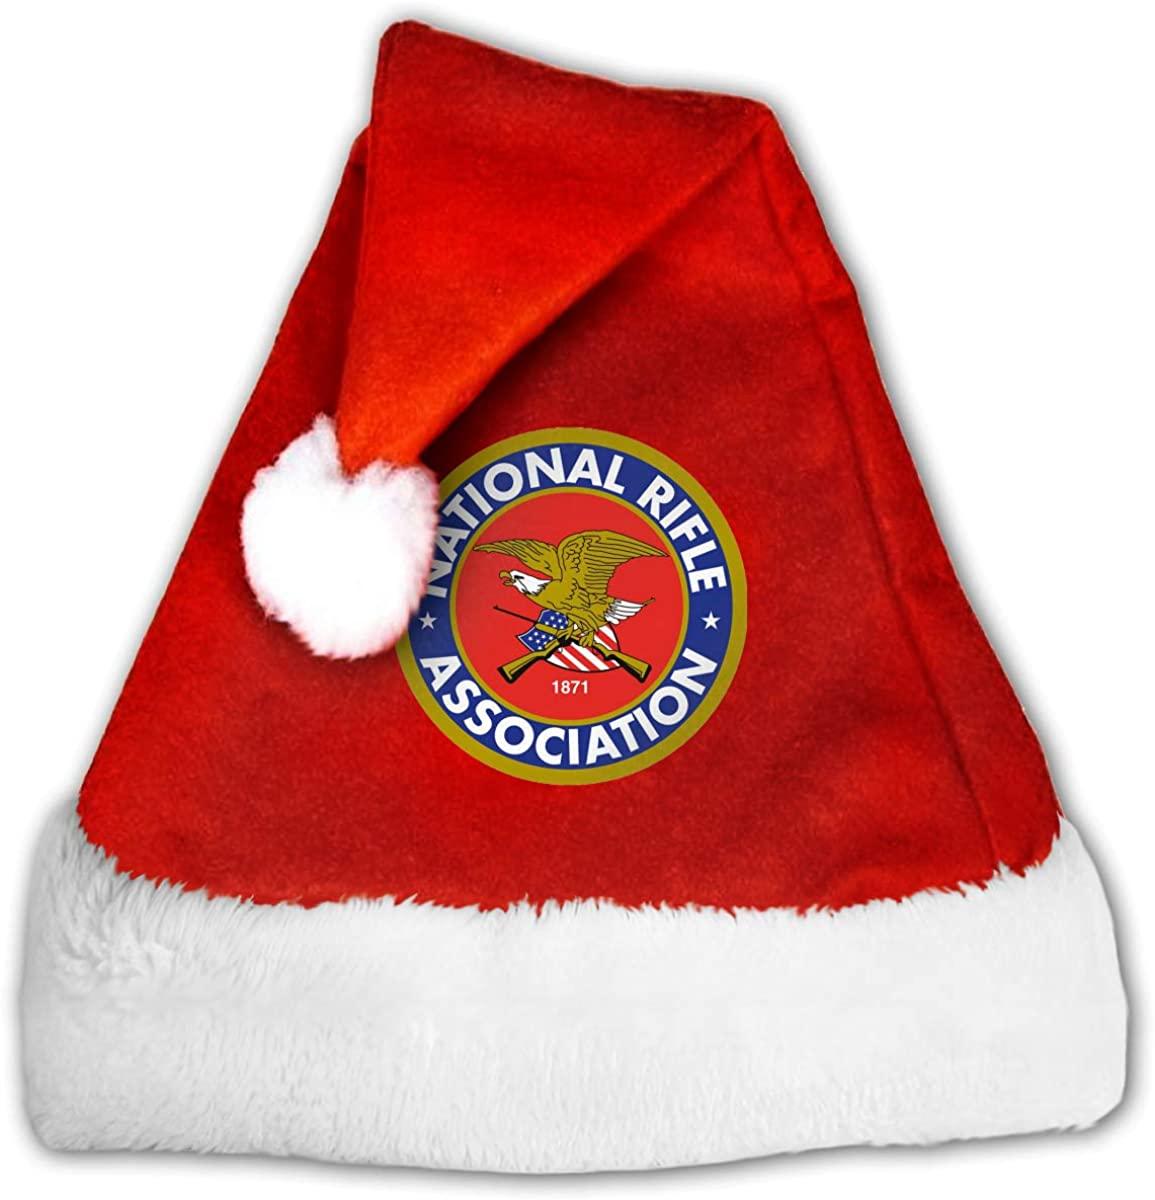 Christmas Hat NRA Gun National Rafle Association Santa Hat for Kids and Adults